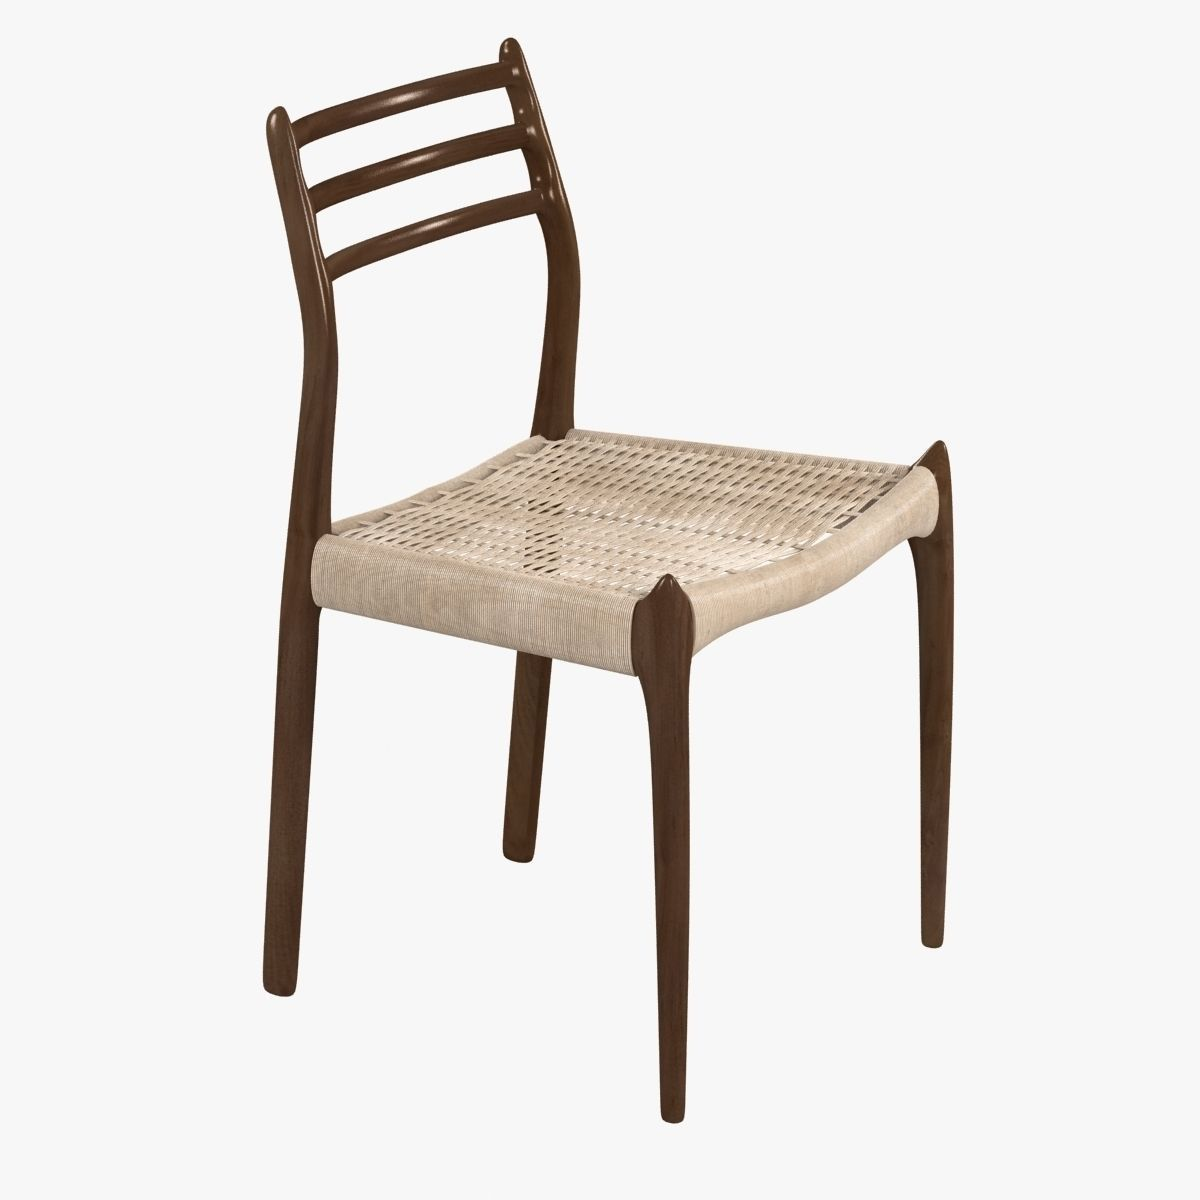 dwr moller model 78 side chair 3d model max obj 3ds fbx skp mtl 1 ... & 3D frame dwr Moller Model 78 Side Chair | CGTrader